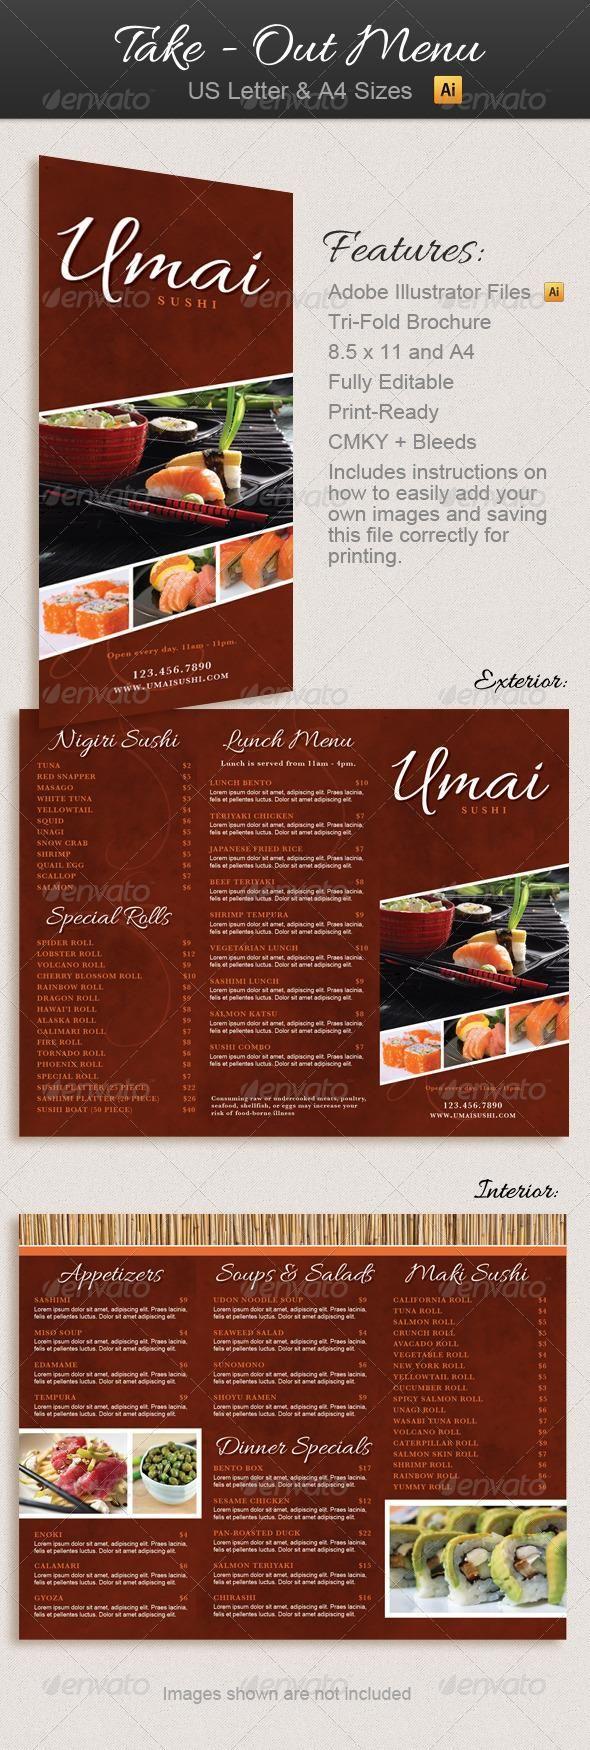 restaurant take out menu trifold brochure ads pinterest menu